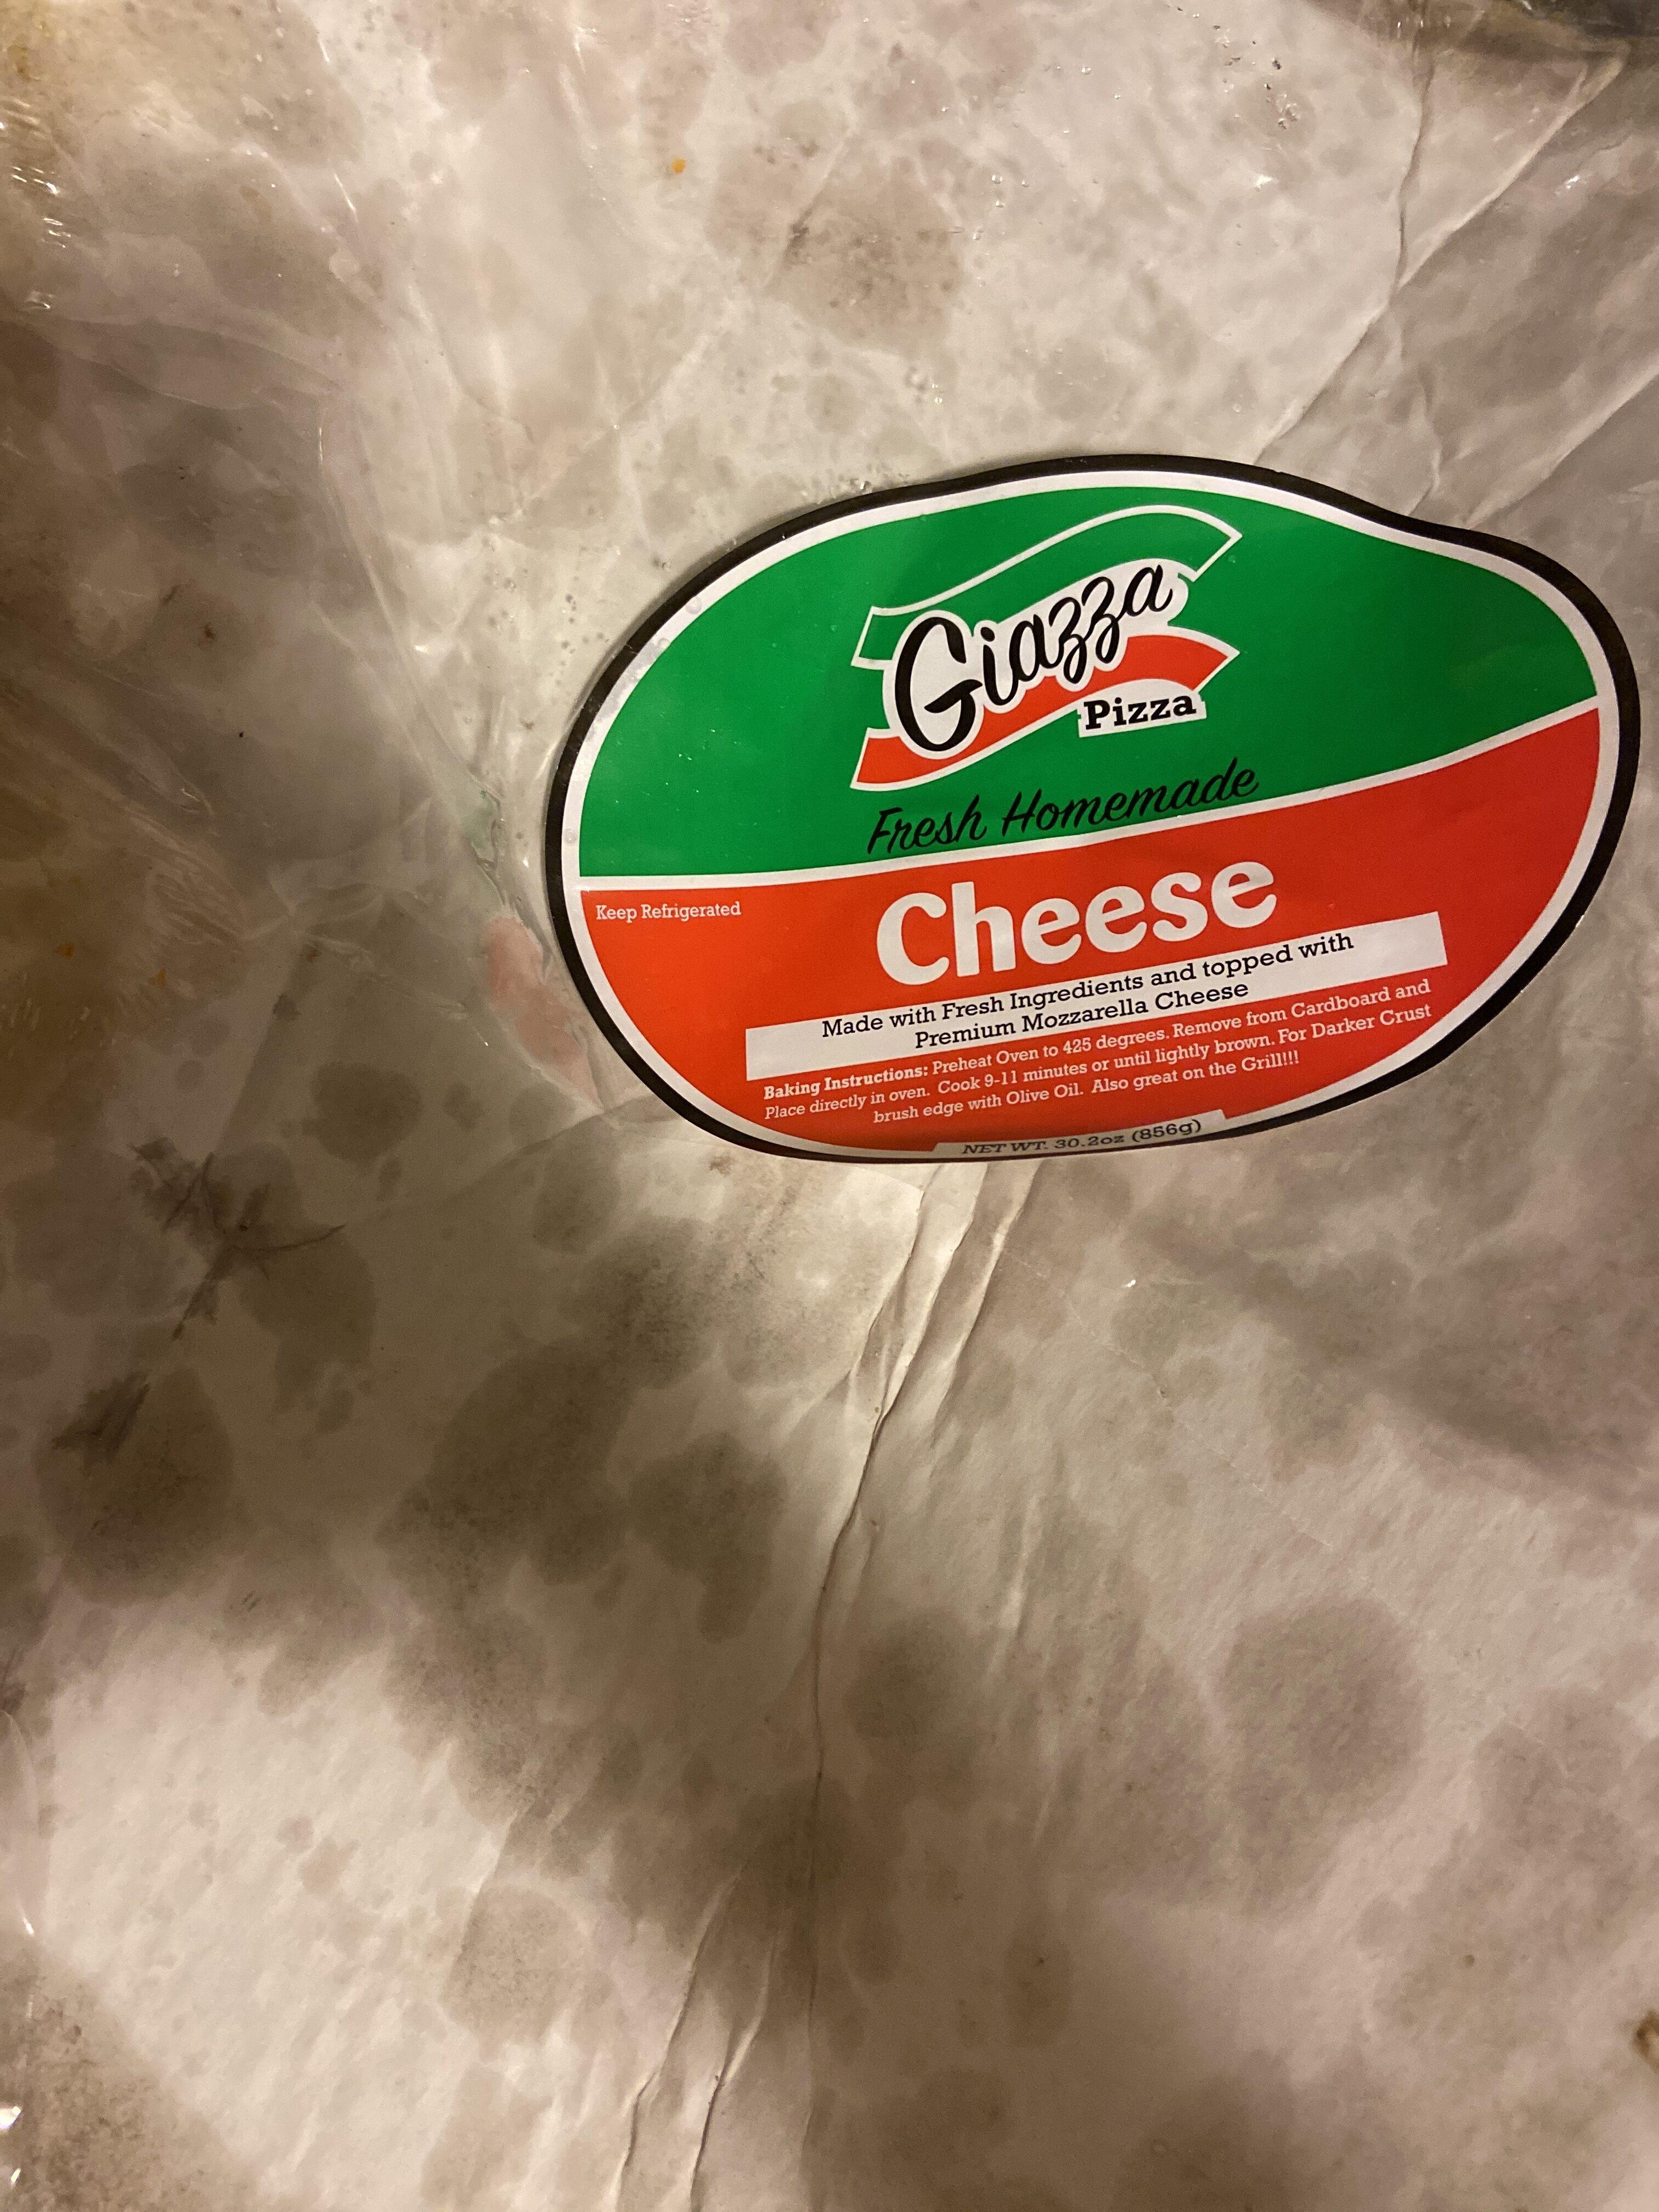 Fresh Homemade Cheese - Product - en